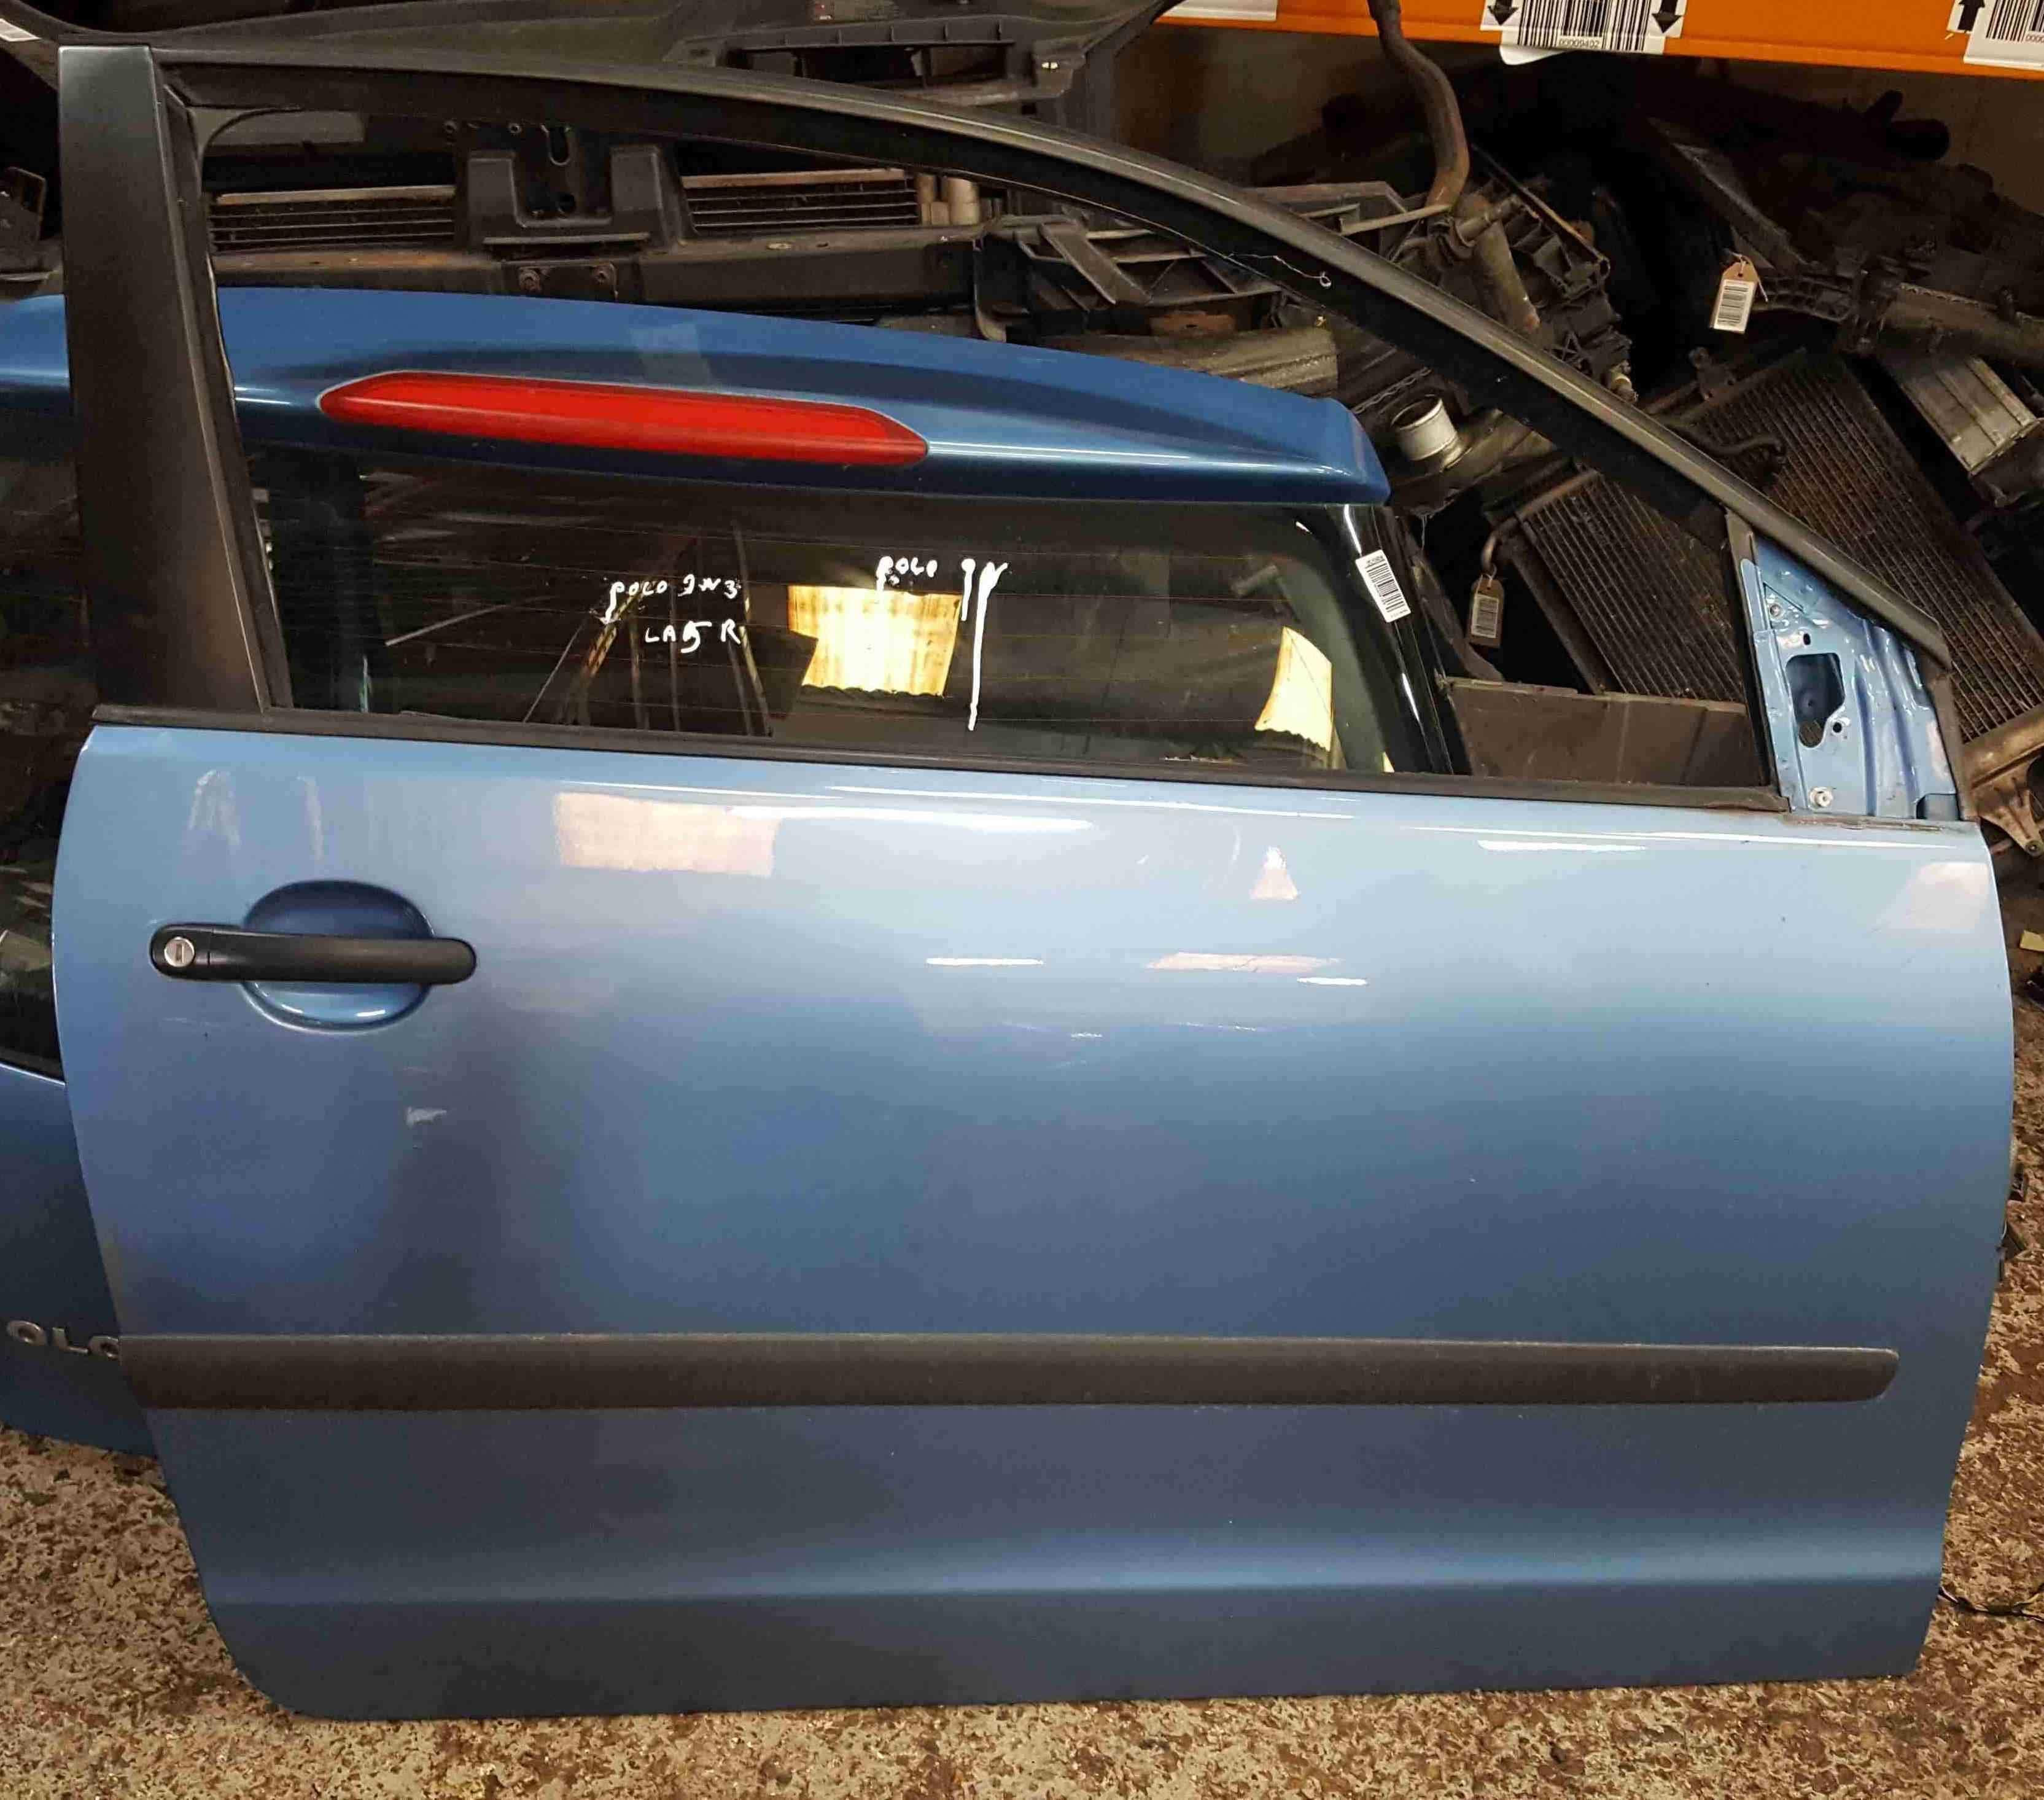 Volkswagen Polo 9N3 2006-2008 Drivers OSF Front Door Blue LA5R 3dr